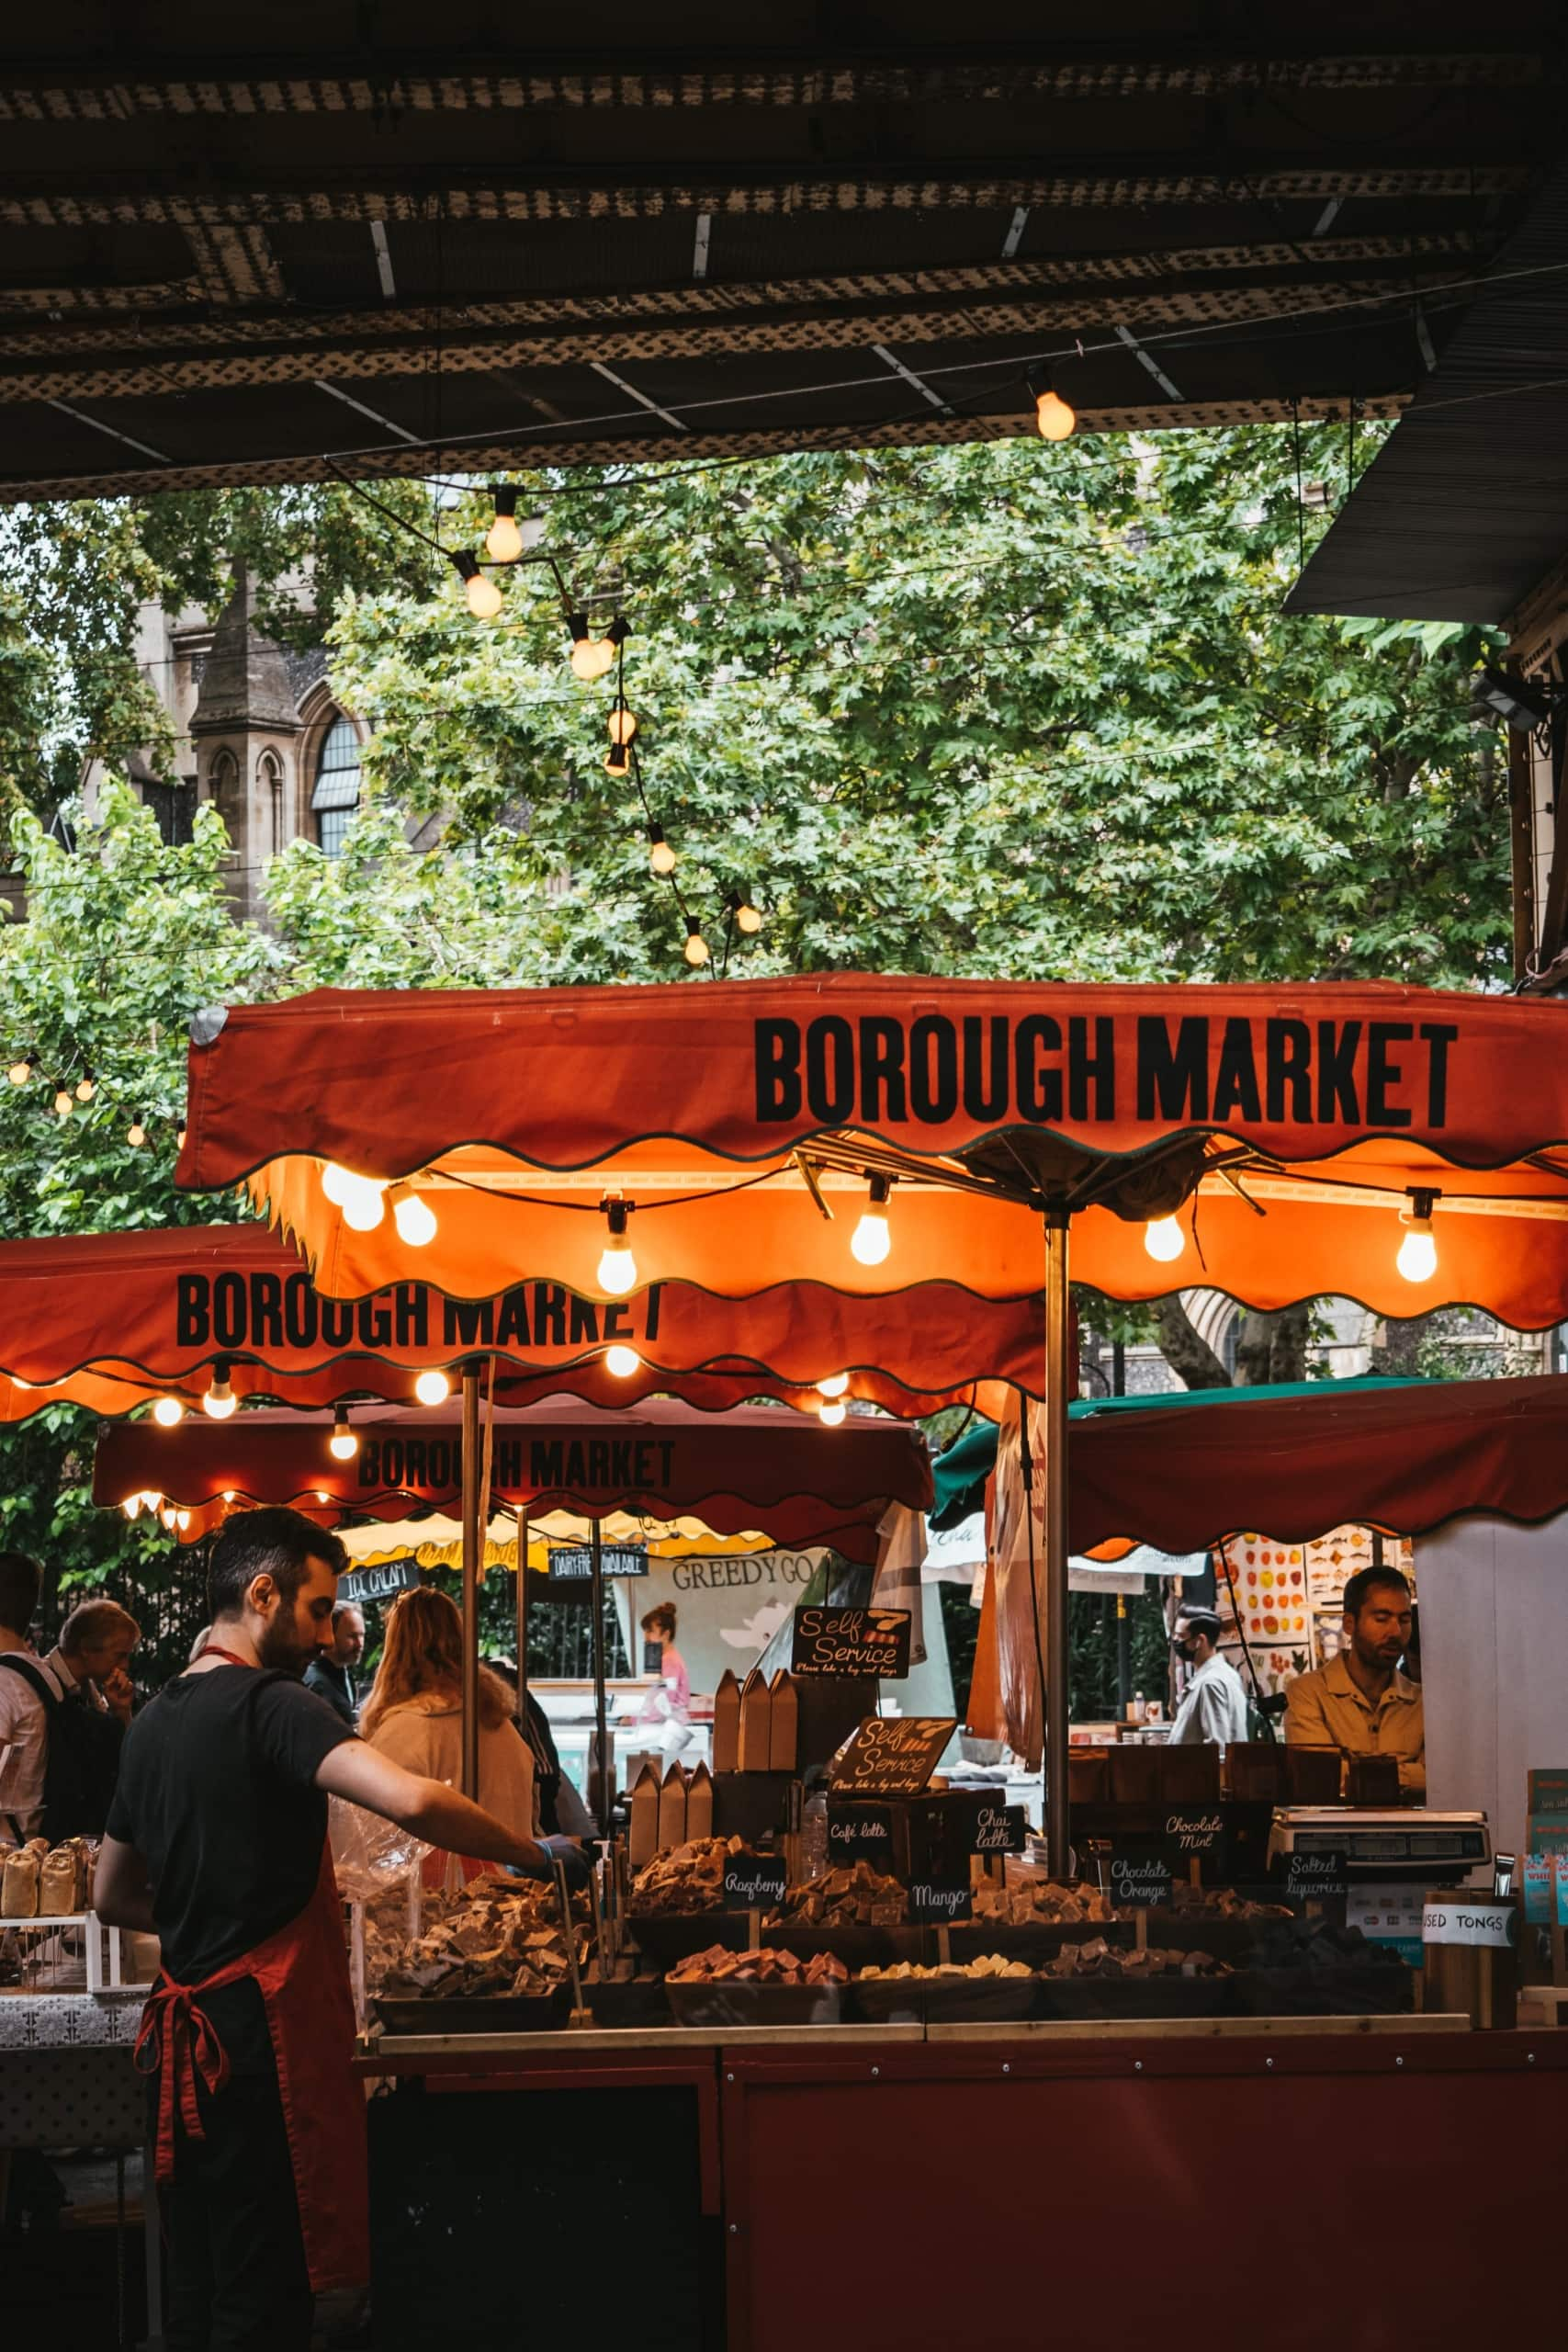 Bourough Markt in London